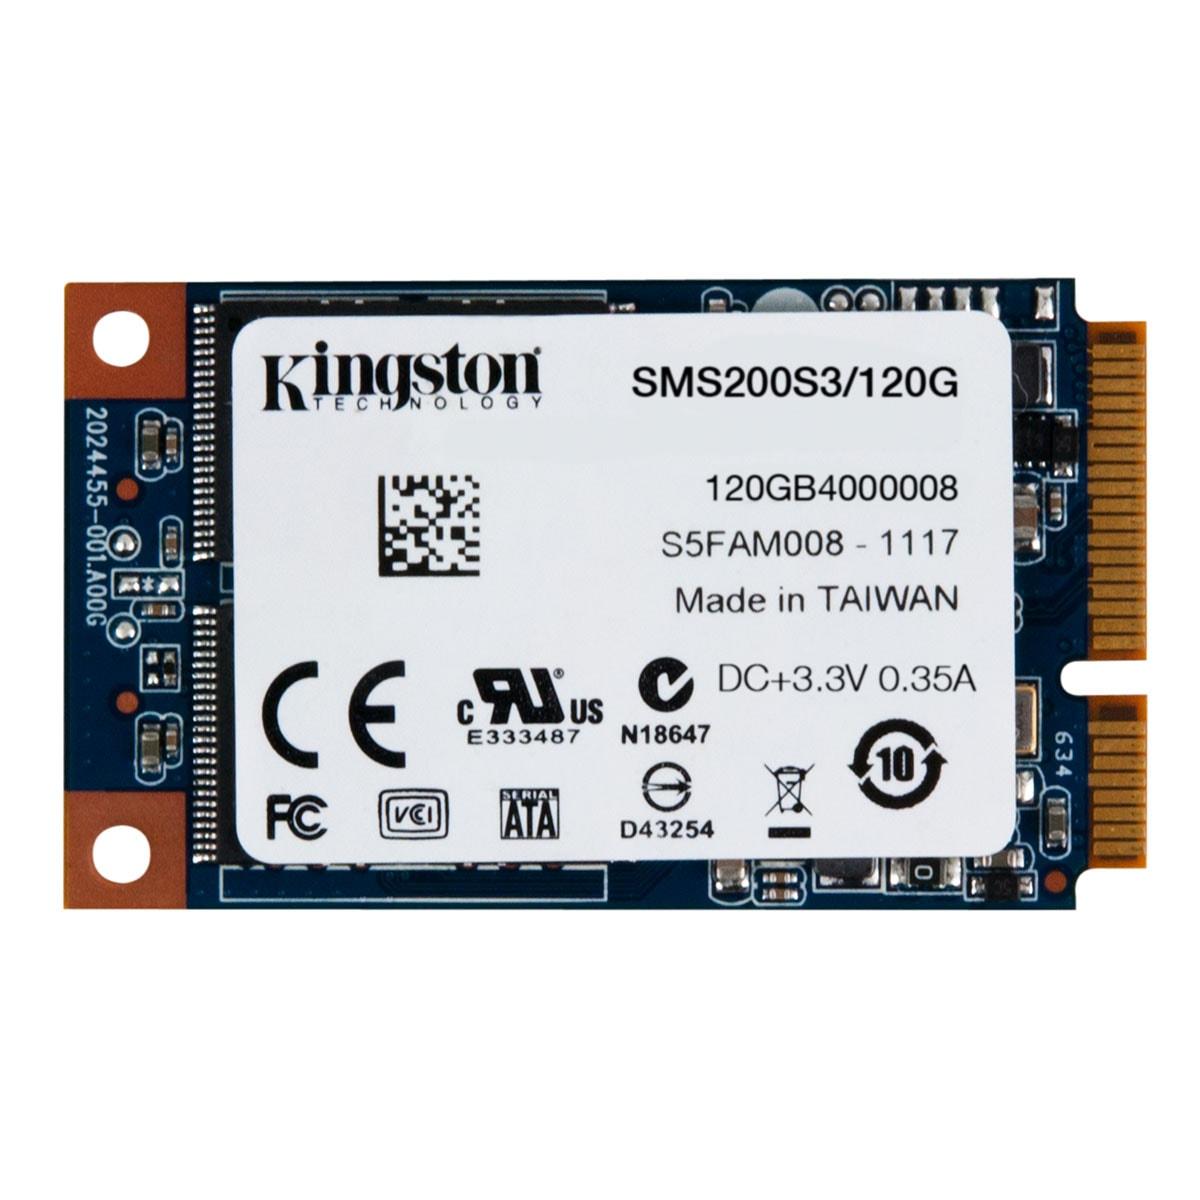 Kingston SMS200S3/120G 120-128Go - Disque SSD Kingston - 1